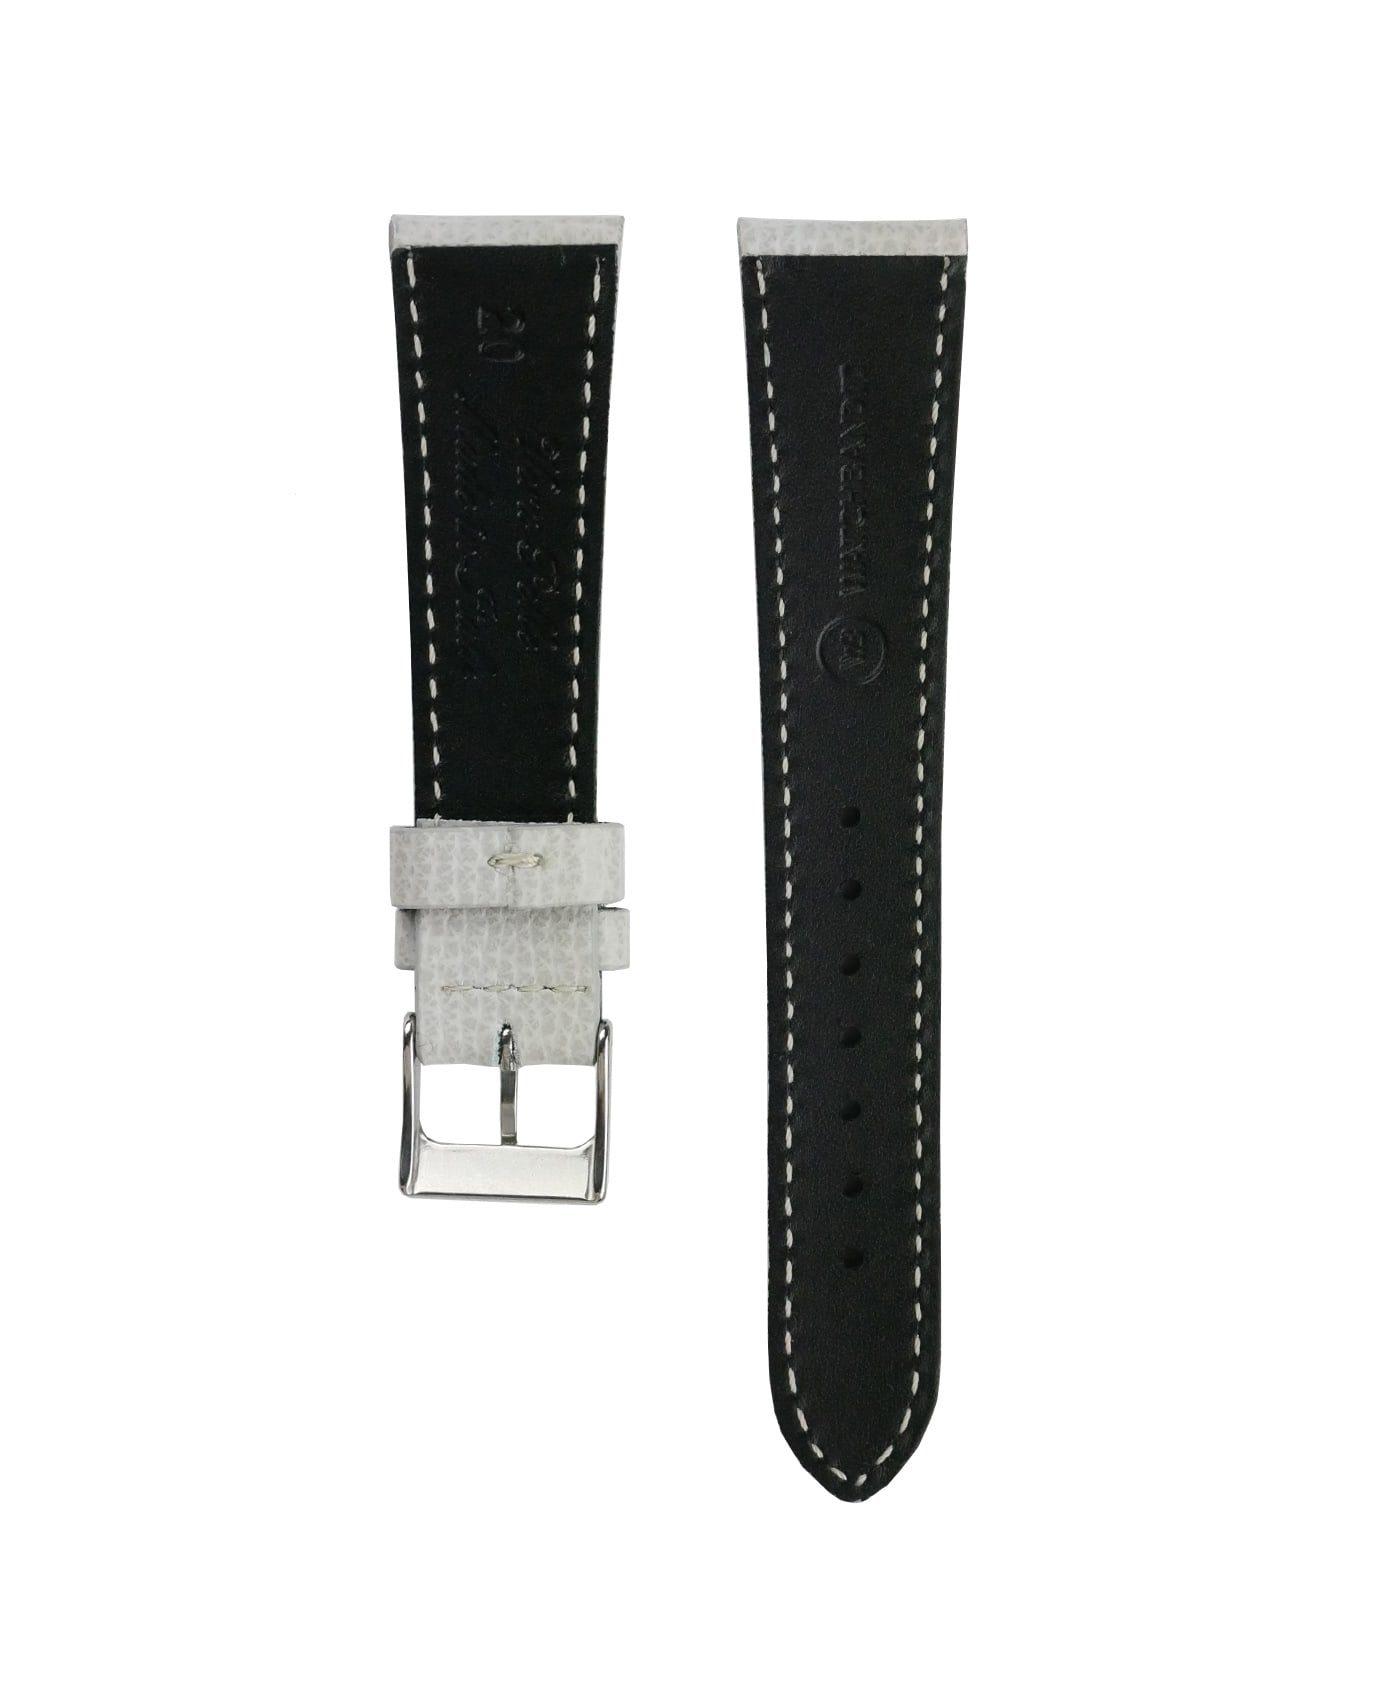 Textured calfskin leather watch strap light grey back watchbandit